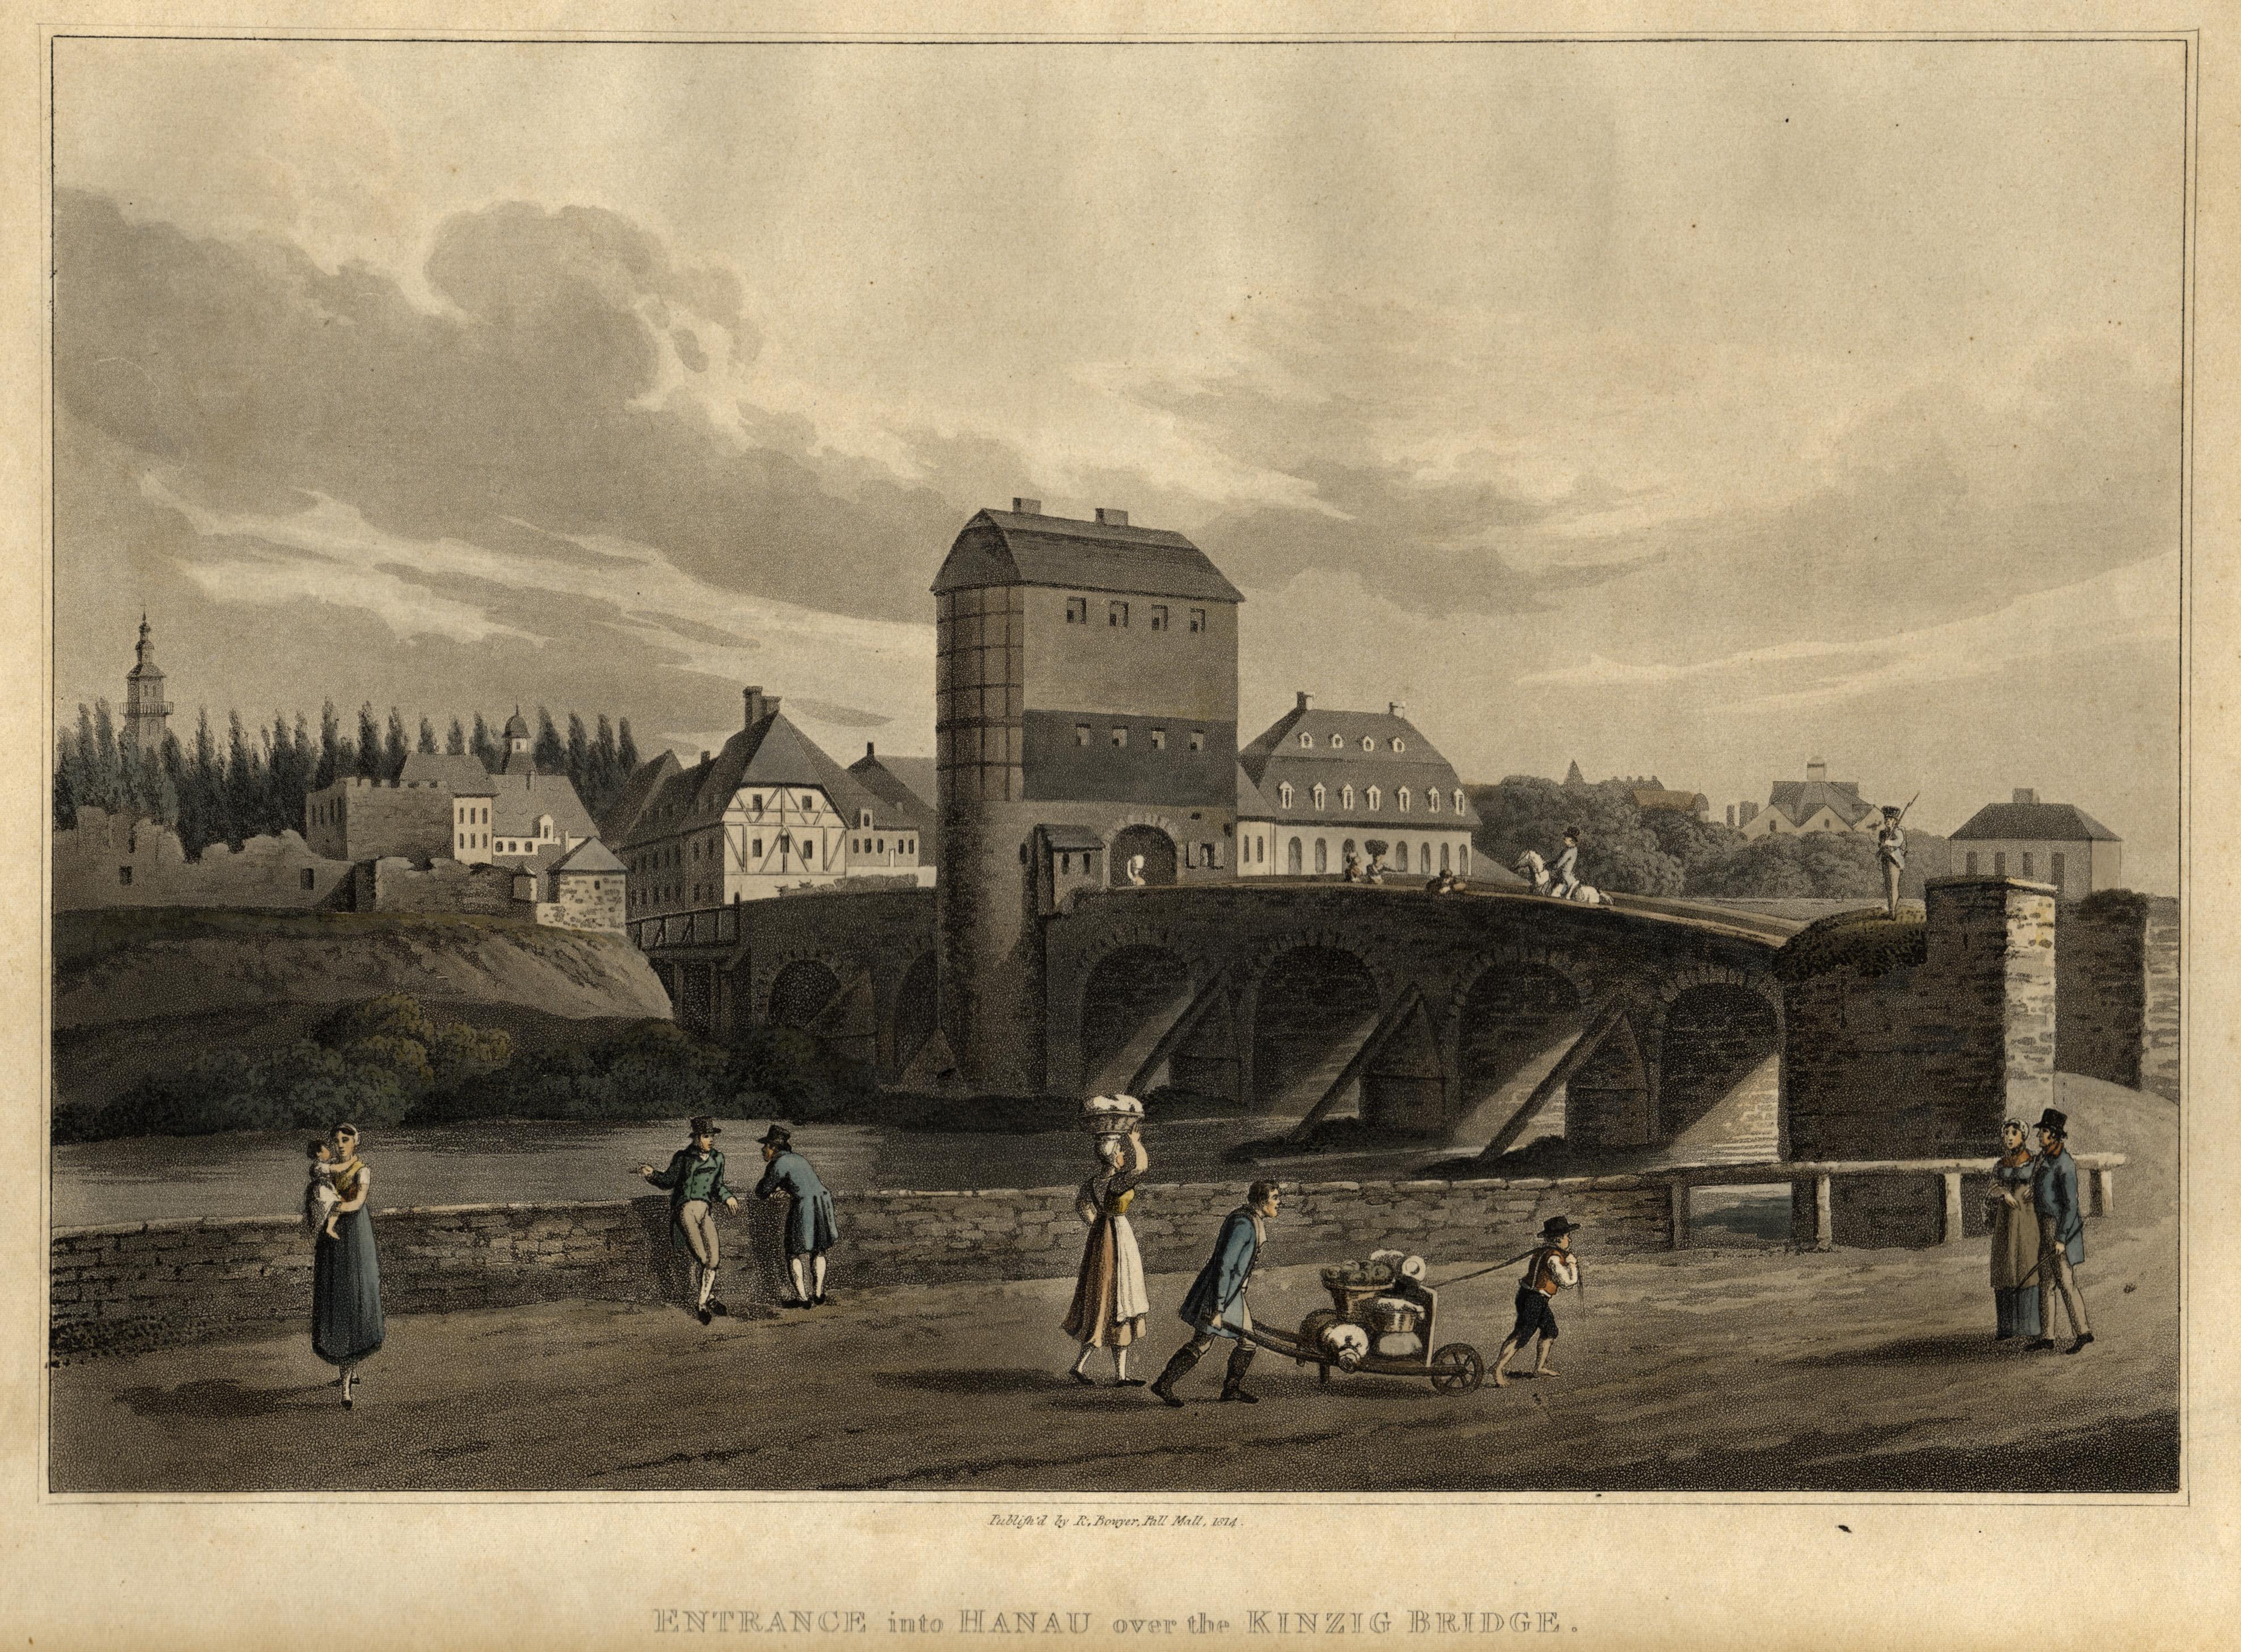 TA., Kinzig Brücke, Blick über die Kinzig: Hanau: